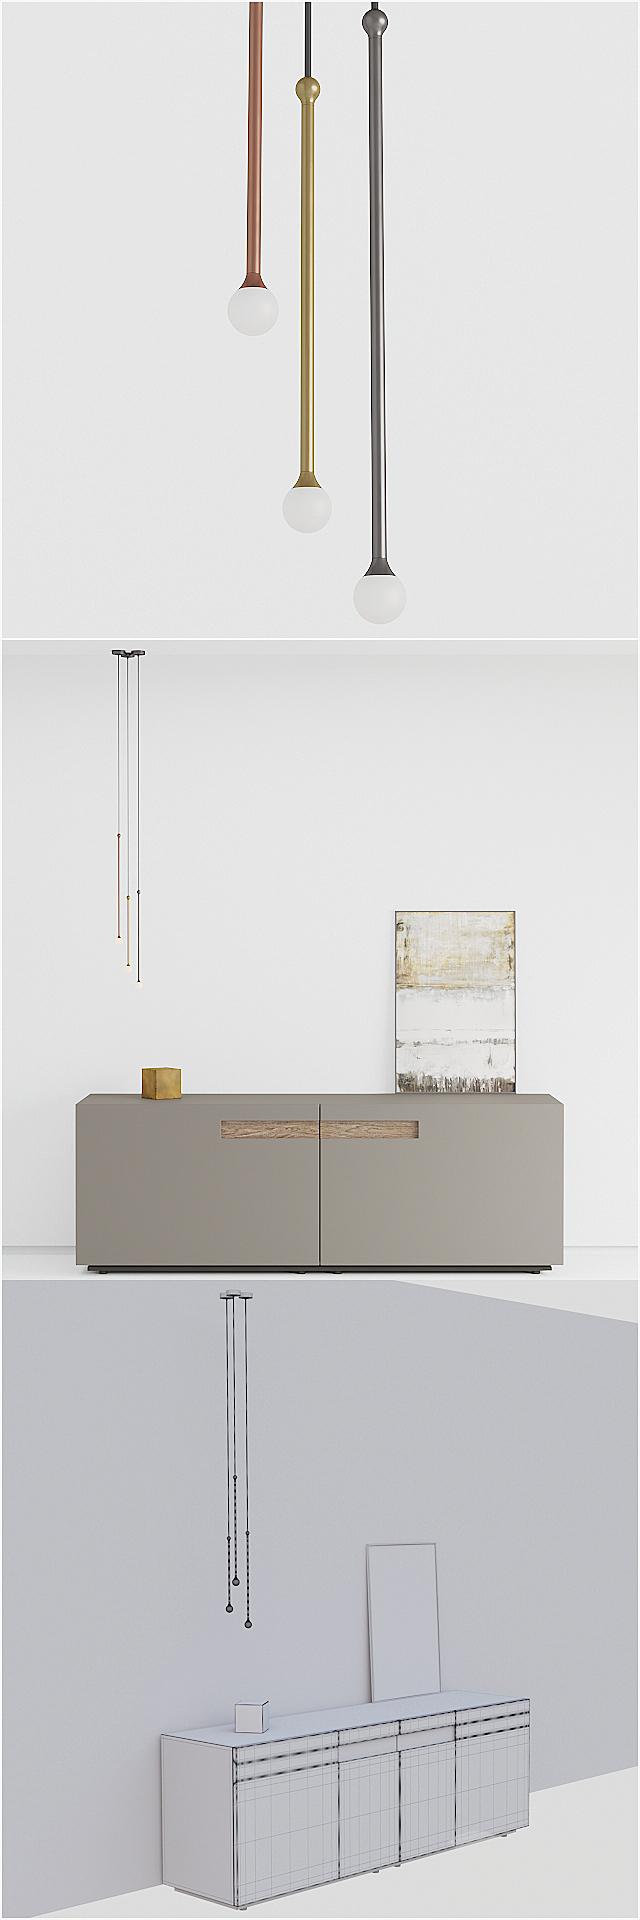 Presotto sideboard / Penta lights / Plaster / Decor